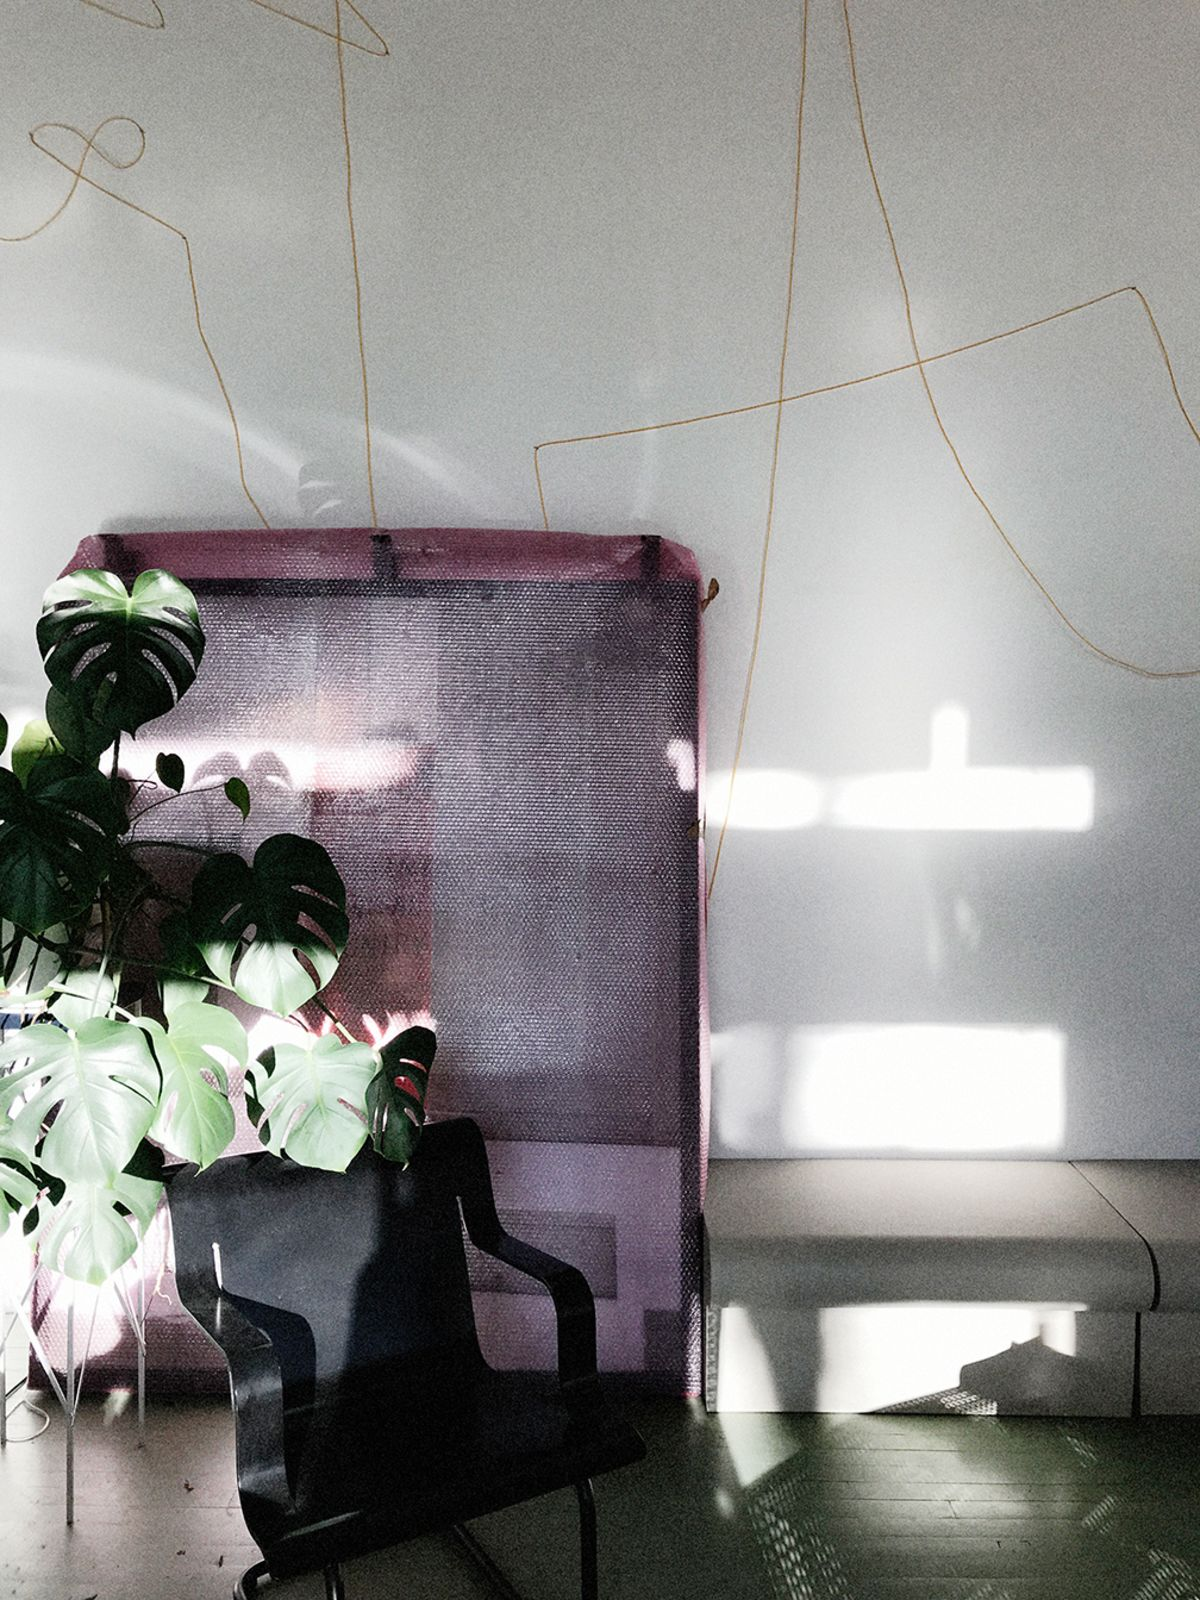 02a_Something Fantastic_Artek_Aalto_Chair26